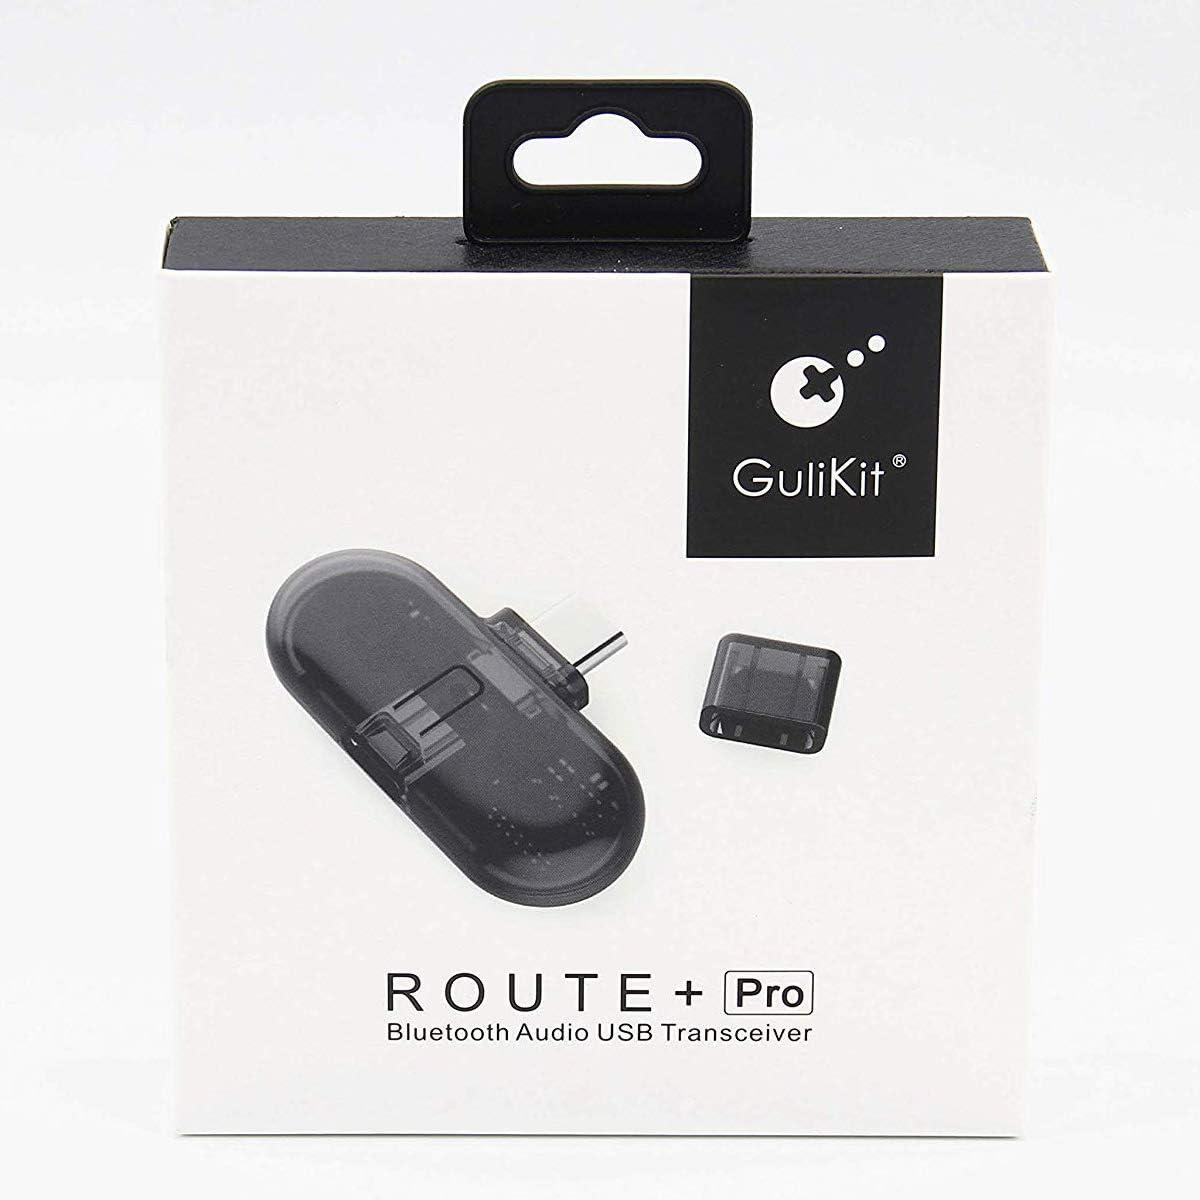 Adaptador Inalámbrico Bluetooth para Nintendo Switch, Route+ Pro USB C Bluetooth Dongle, Wireless Transmisor y Receptor de Audio aptX con Micrófono para PC, Auriculares Bluetooth, Altavoz